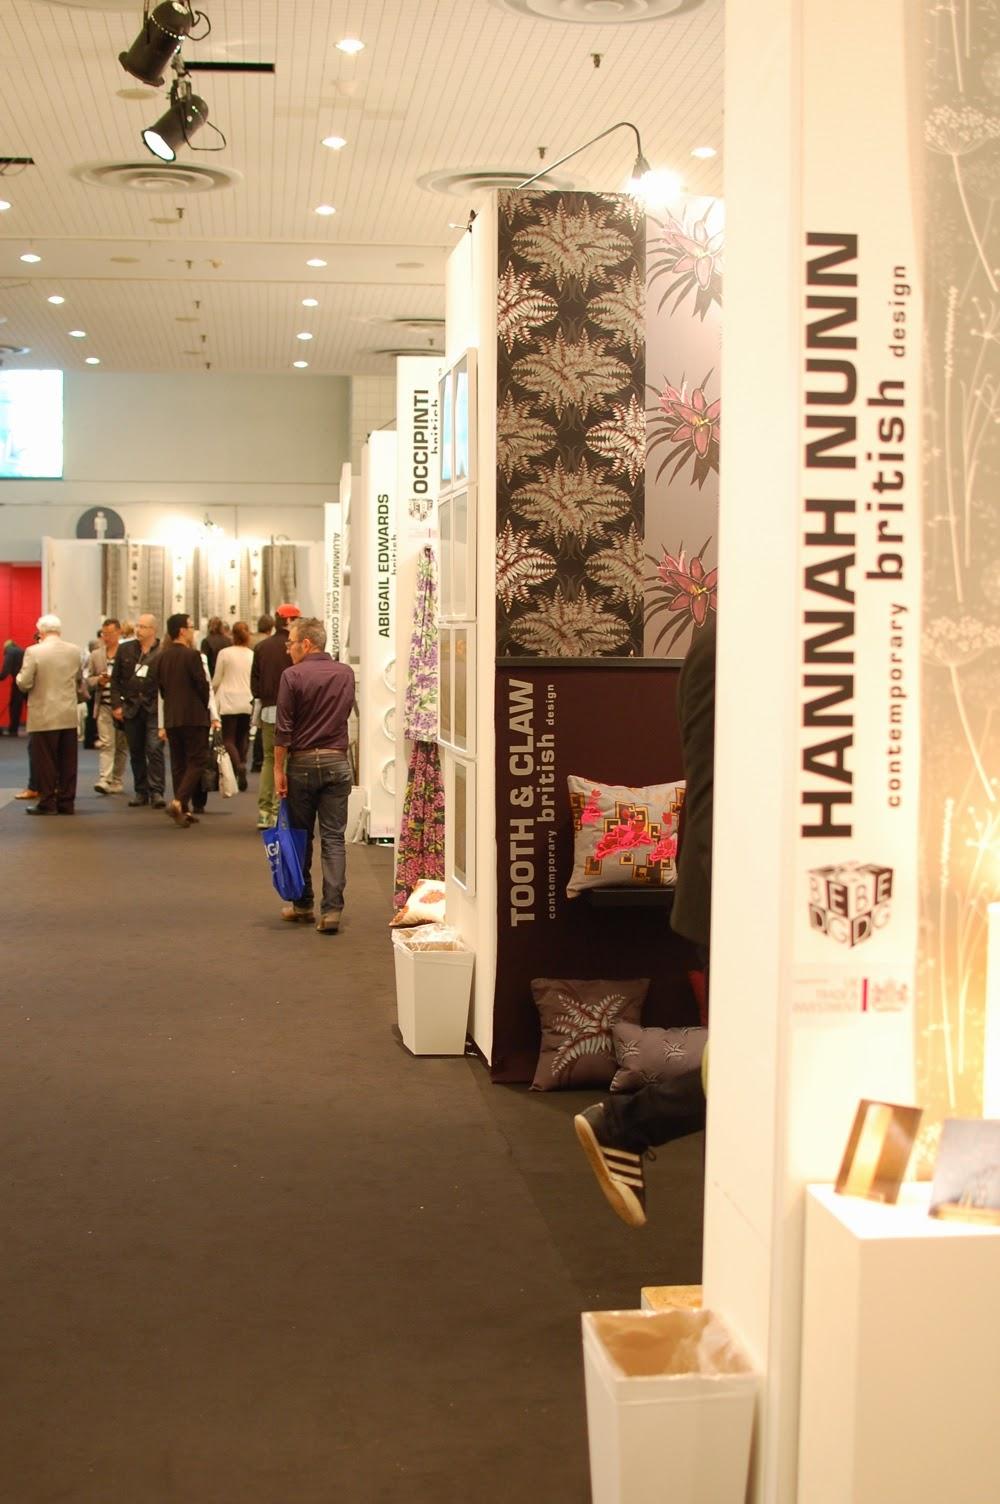 Hannah nunn icff for Icff exhibitors 2014